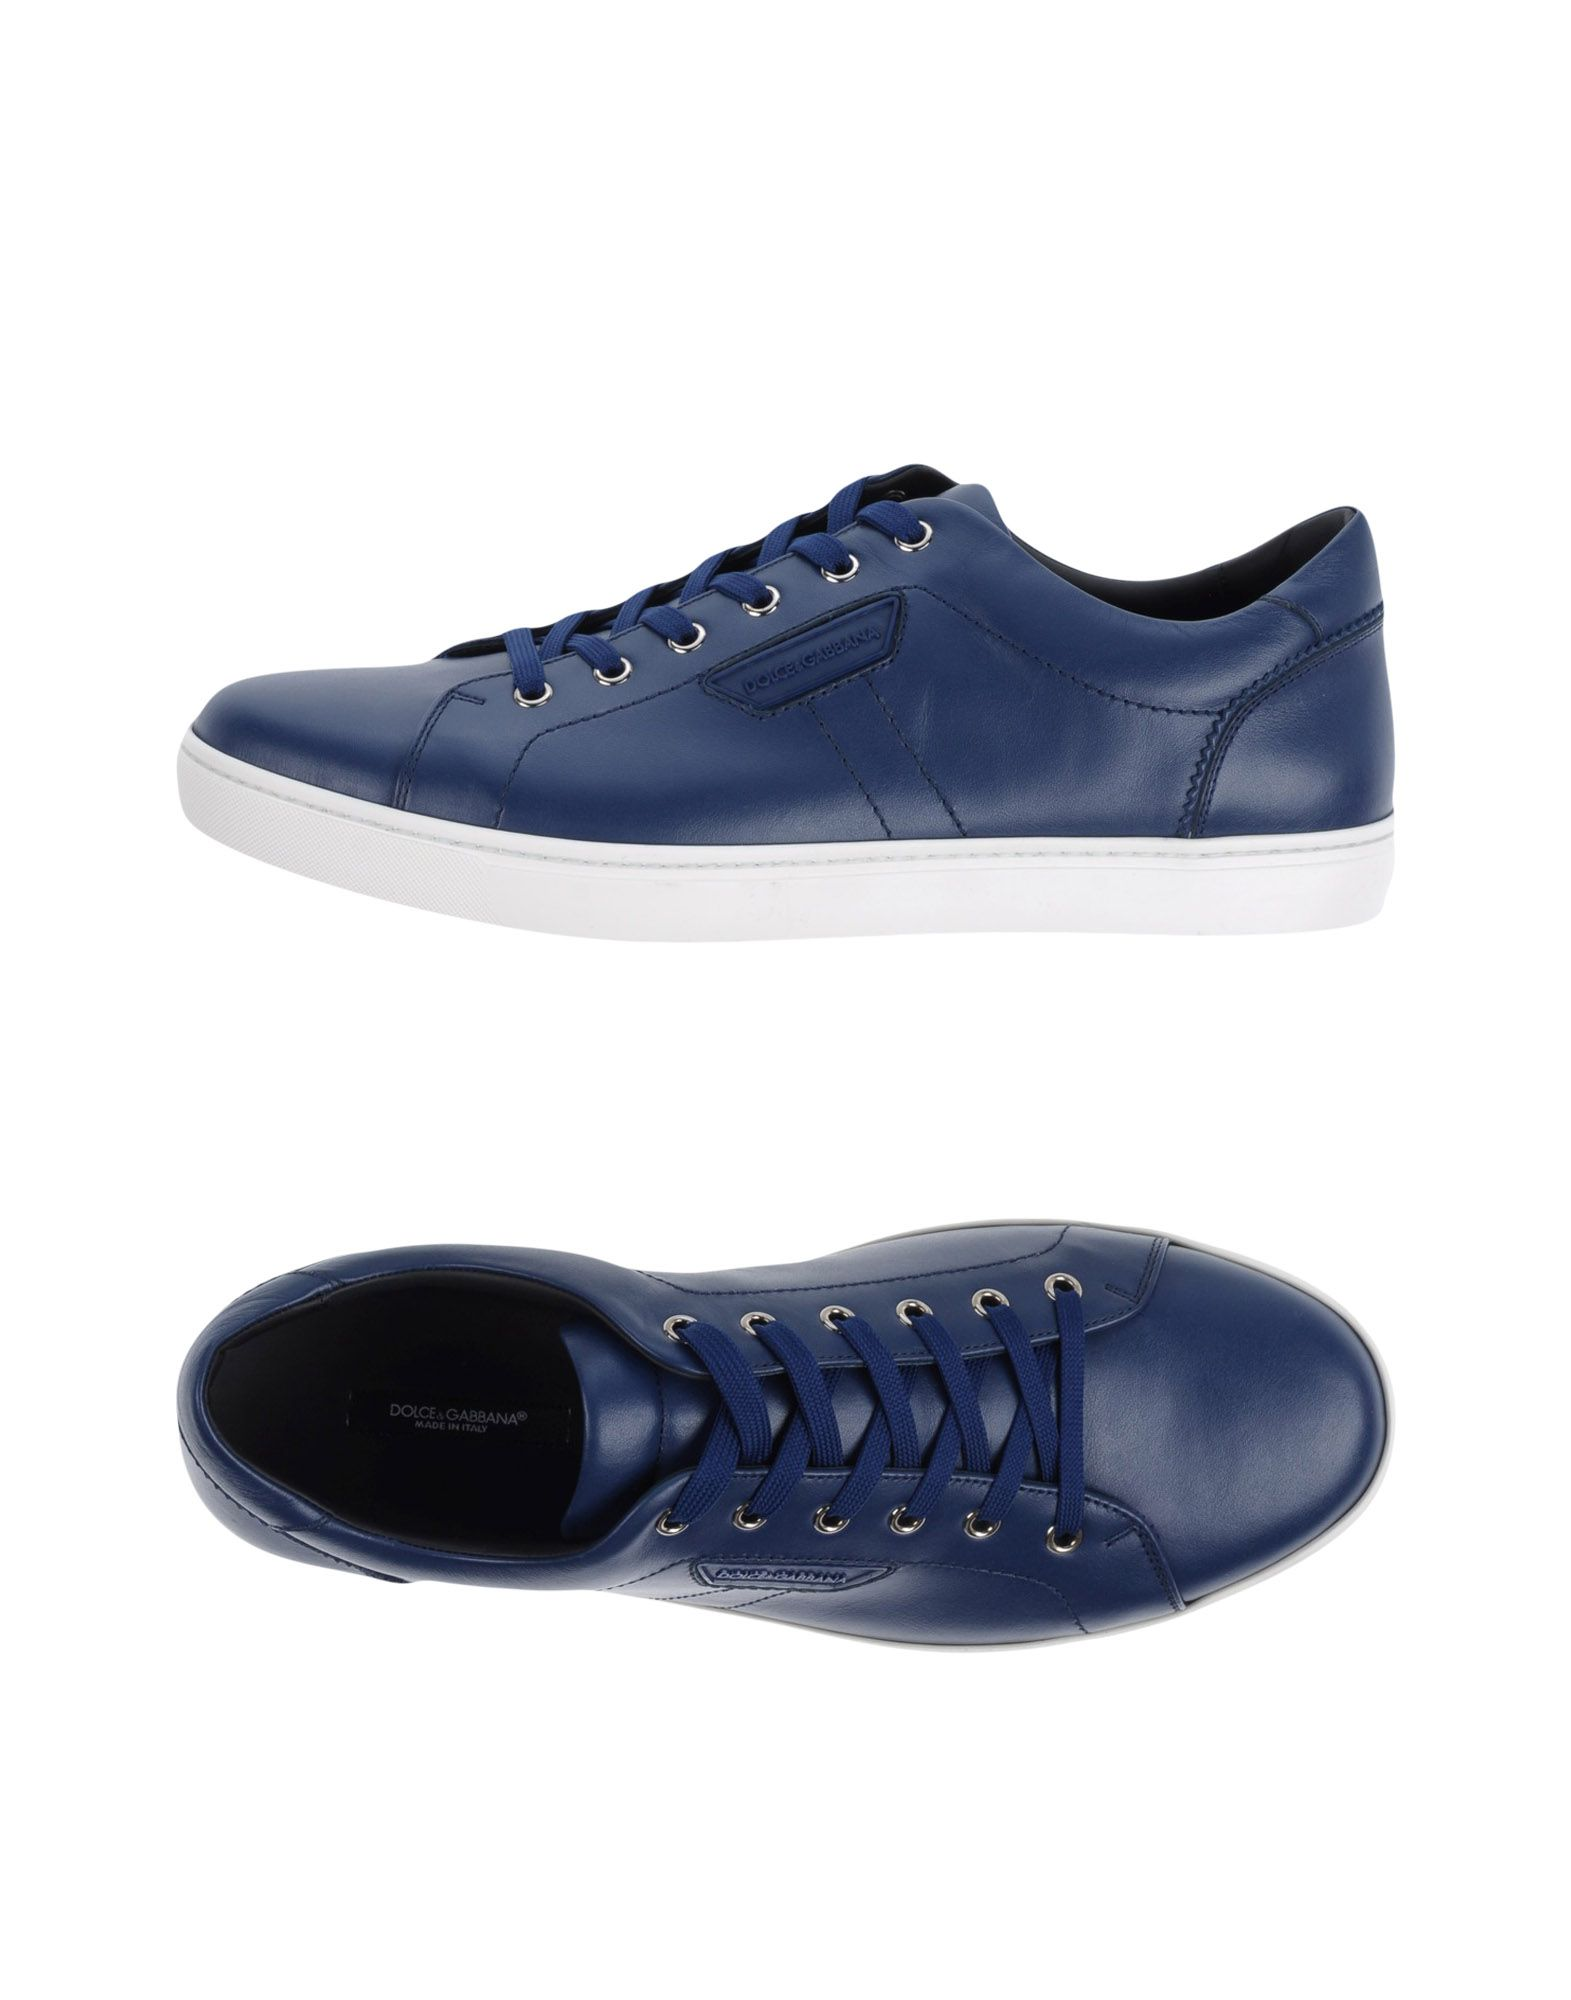 Dolce Gabbana & Gabbana Dolce Sneakers Herren  11159055MA a9fdd3